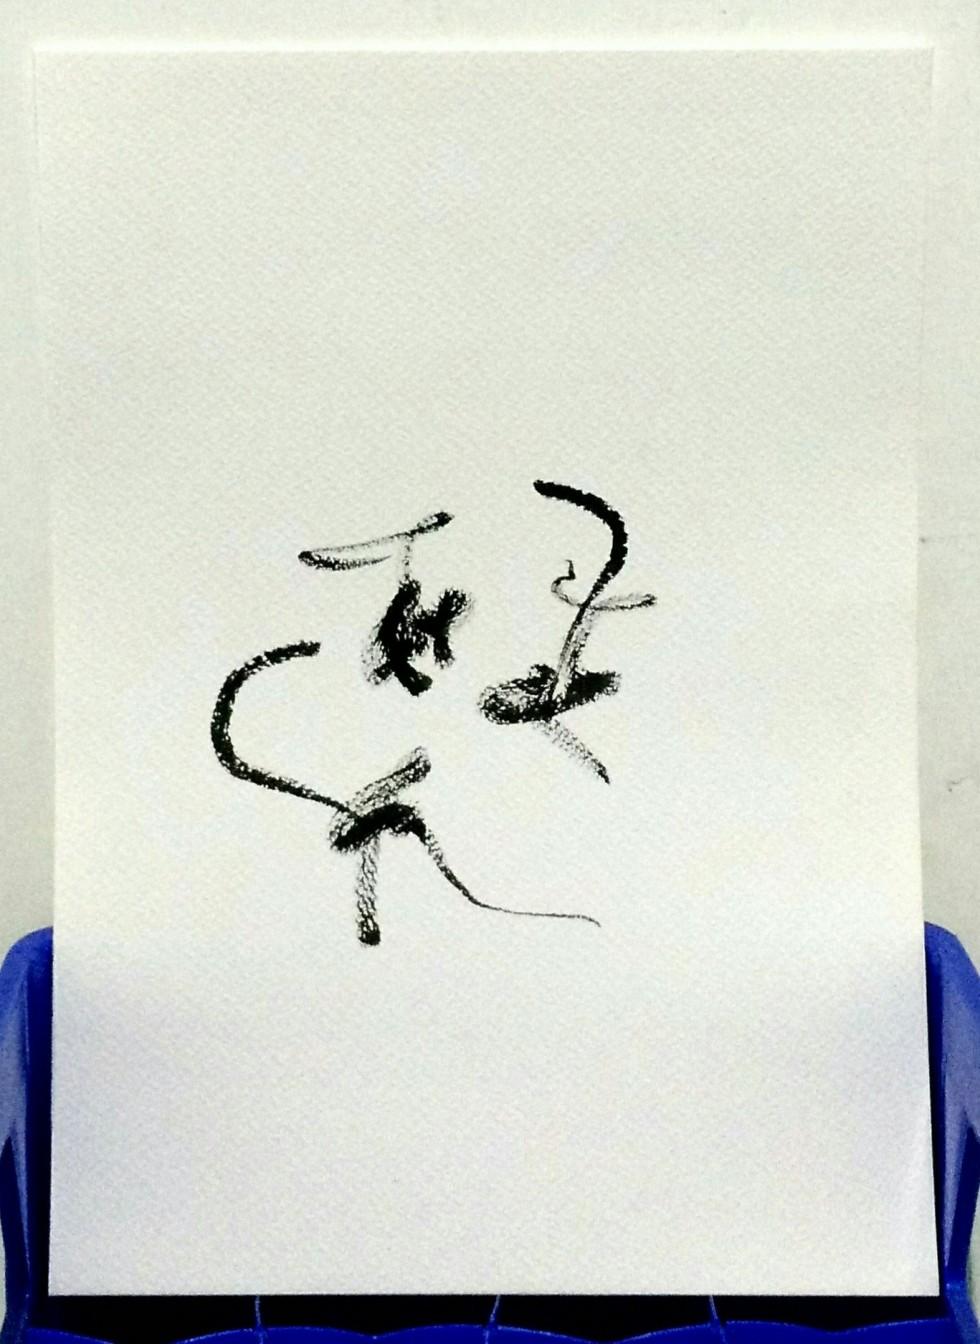 HAISUL, abstract, abstracto, essence, esssentialist, essentialism, esencialista, esencia, TINTA CHINA, INK